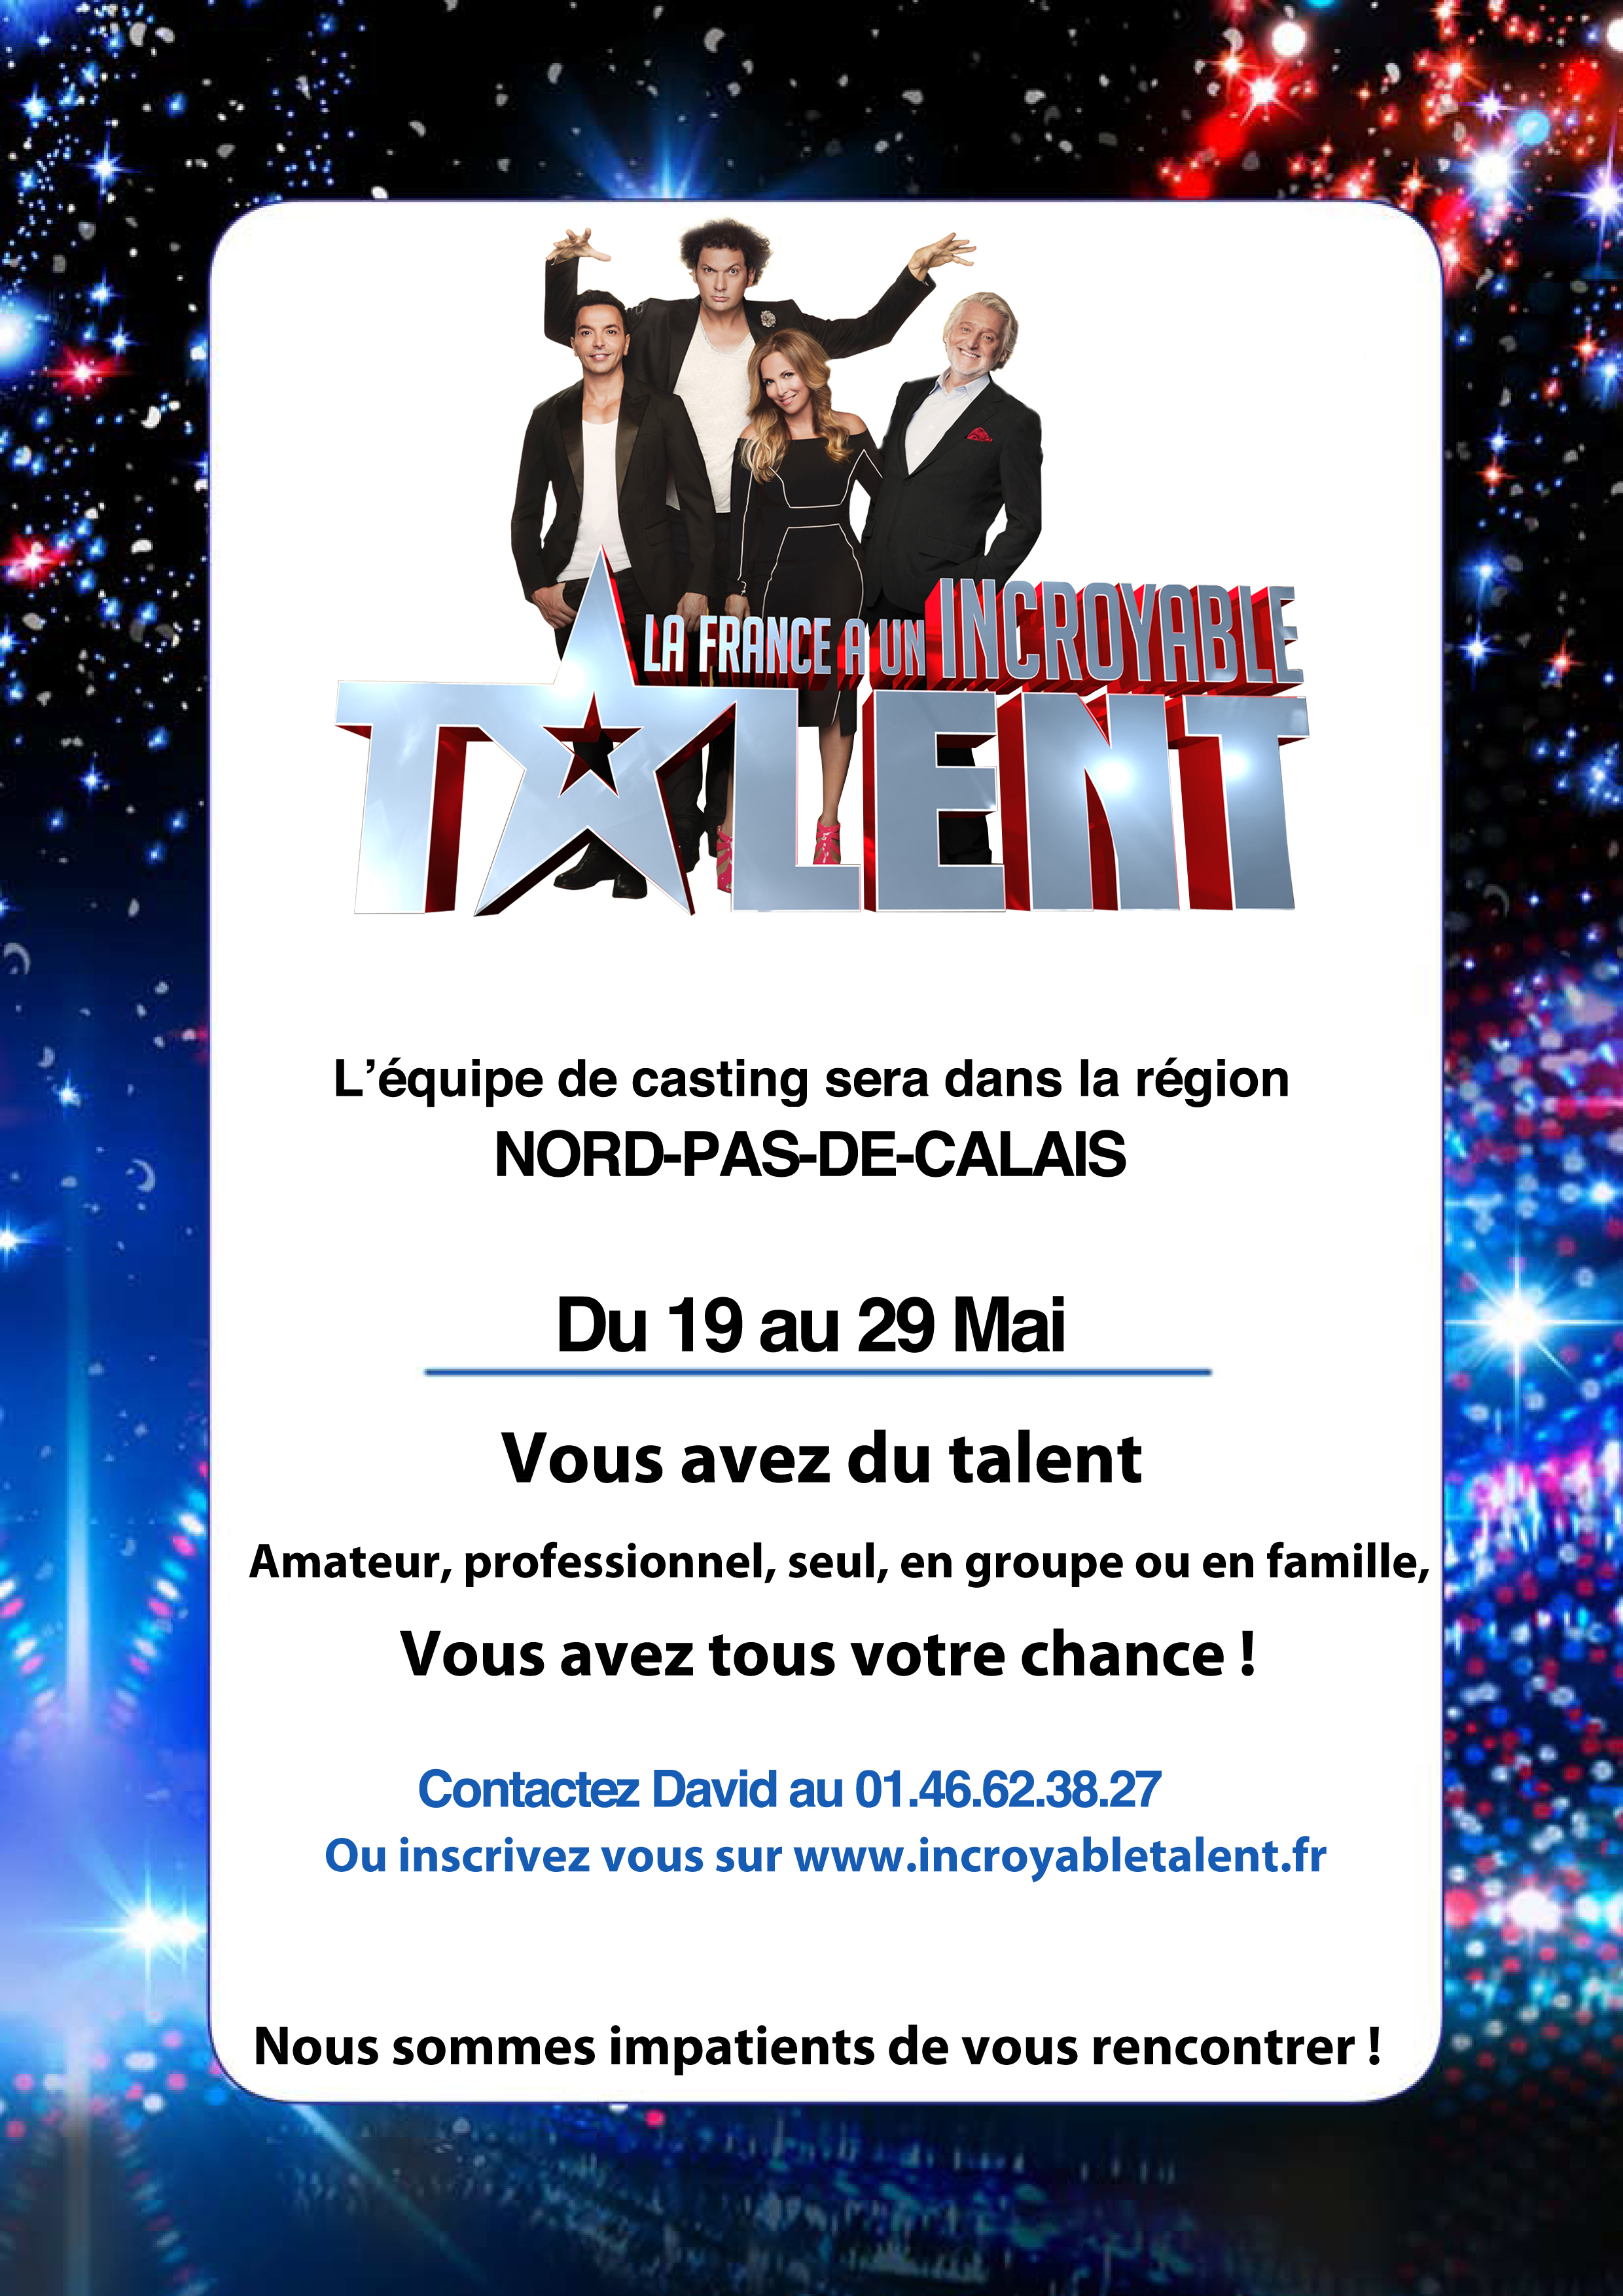 Casting Incroyable Talent du 19 au 29 mai 2016